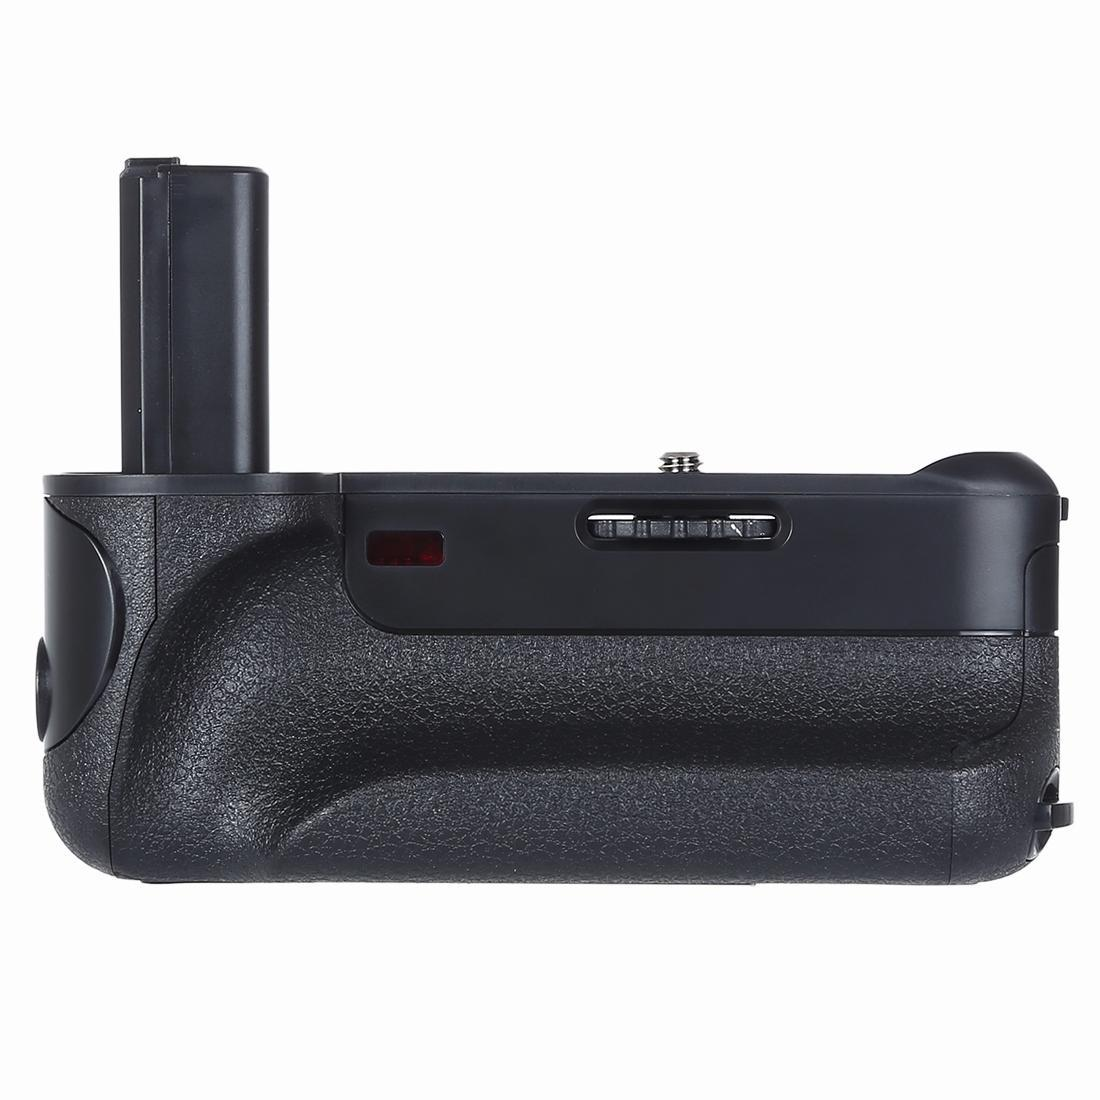 PULUZ Vertical Camera Battery Grip for Sony A6000 Digital SLR Camera